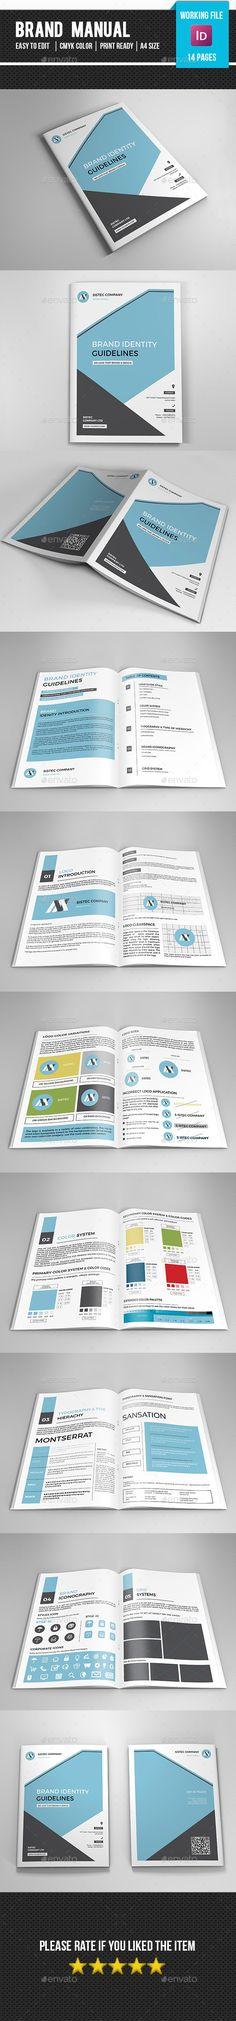 Brand Manual Brochure Template #design Download: http://graphicriver.net/item/brand-manualv03/12829385?ref=ksioks